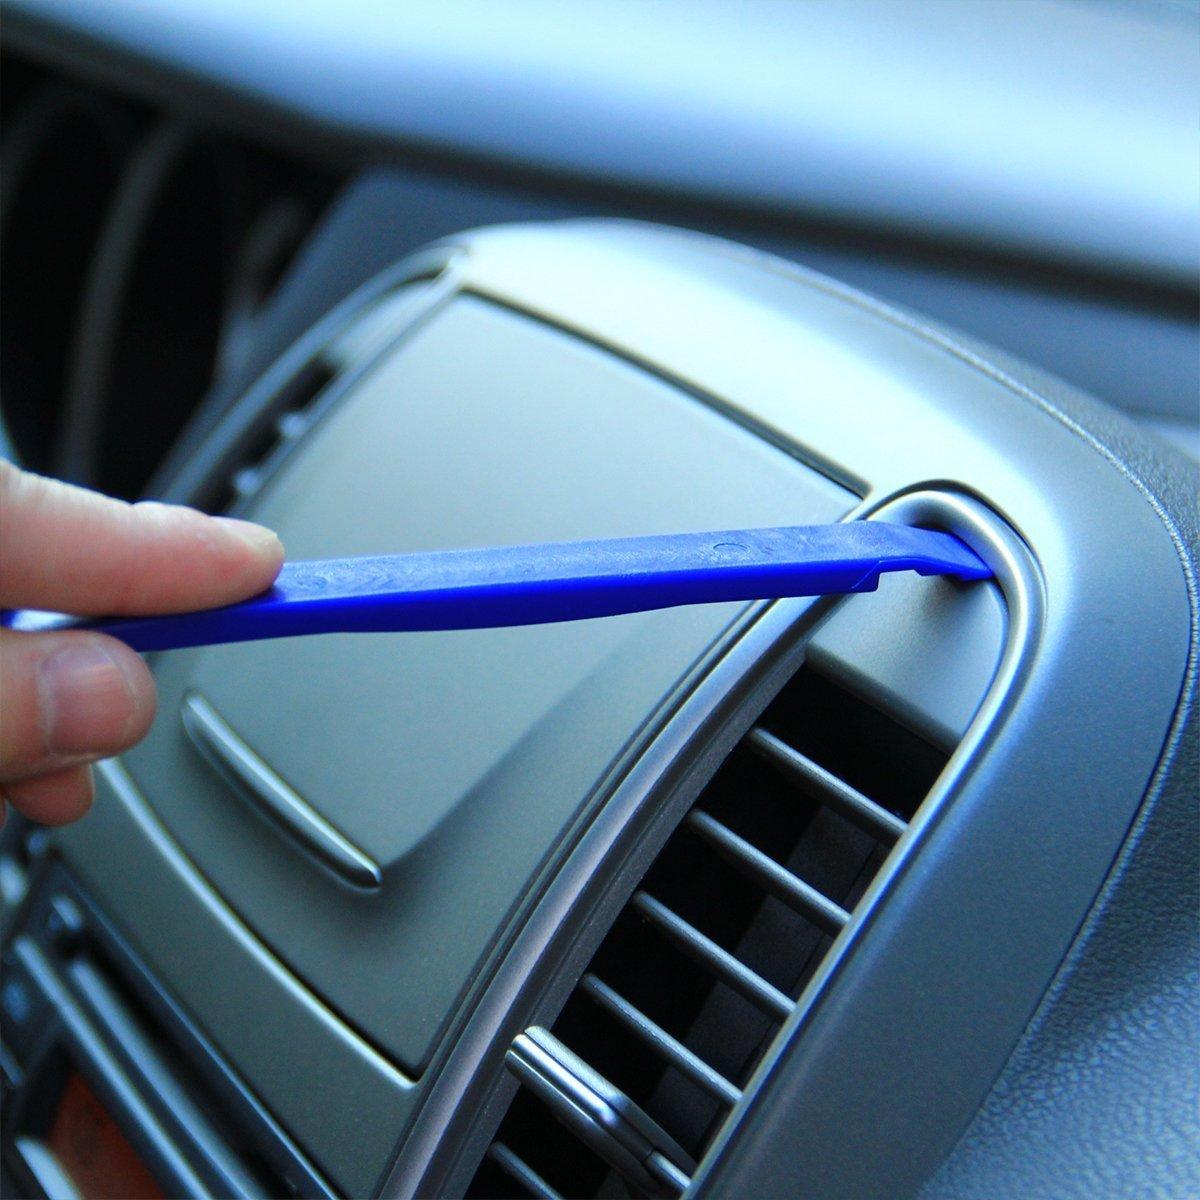 EKIND 12 Pcs Car Dash Radio Audio Installer Pry Tool Include 11pcs Auto Trim Removal Multi-Use Panel Tool Kit and 1pcs Fastener Remover